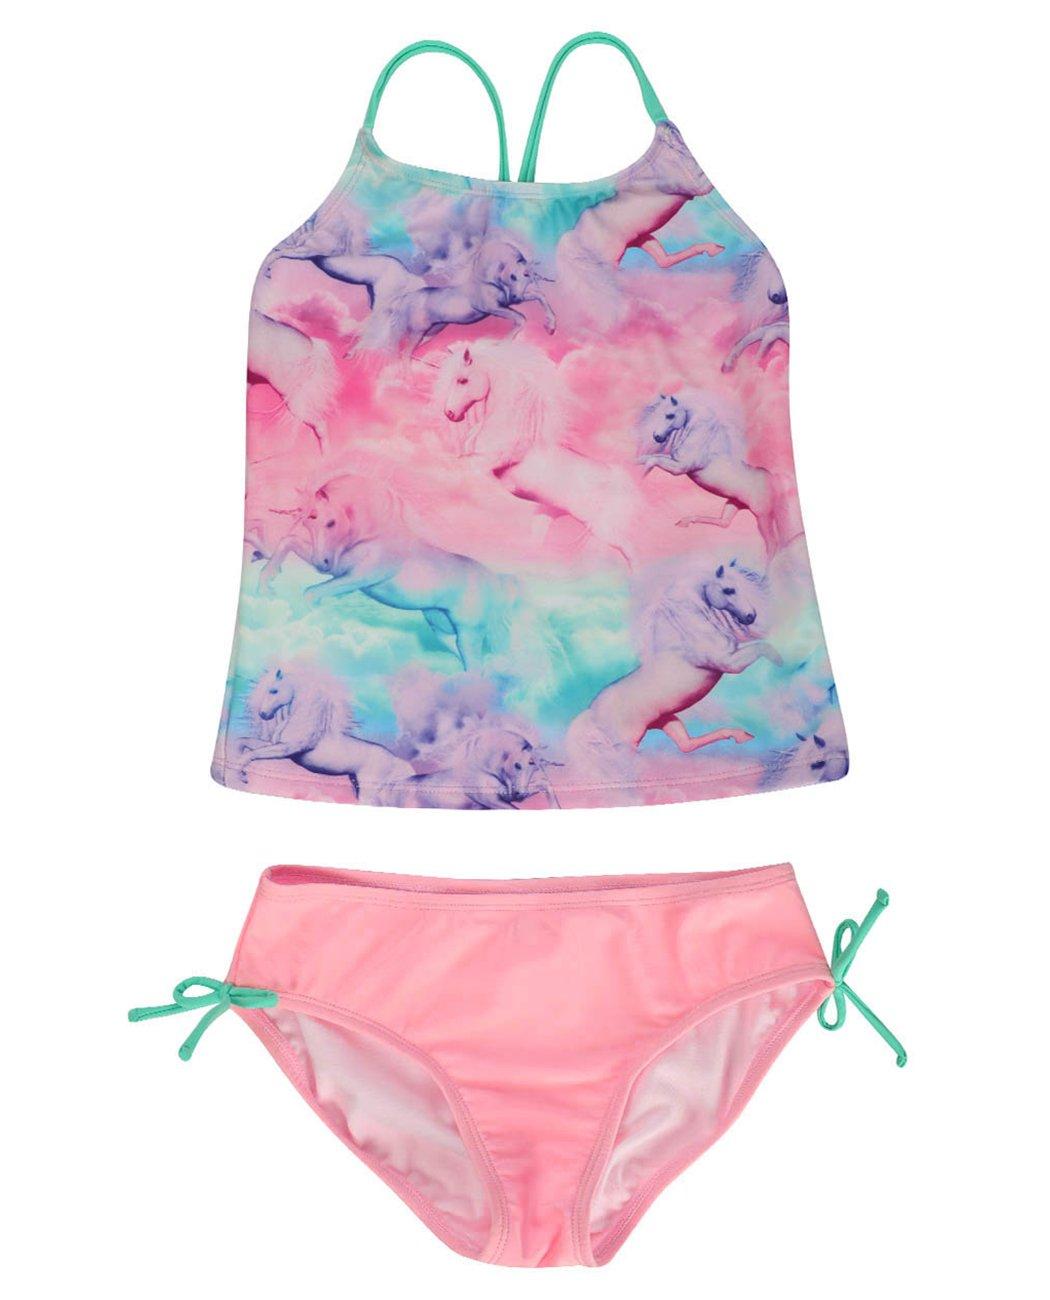 iDrawl Girls Two Piece Swimwear, Racerback Beach Swimming Bathing Suits by iDrawl (Image #5)